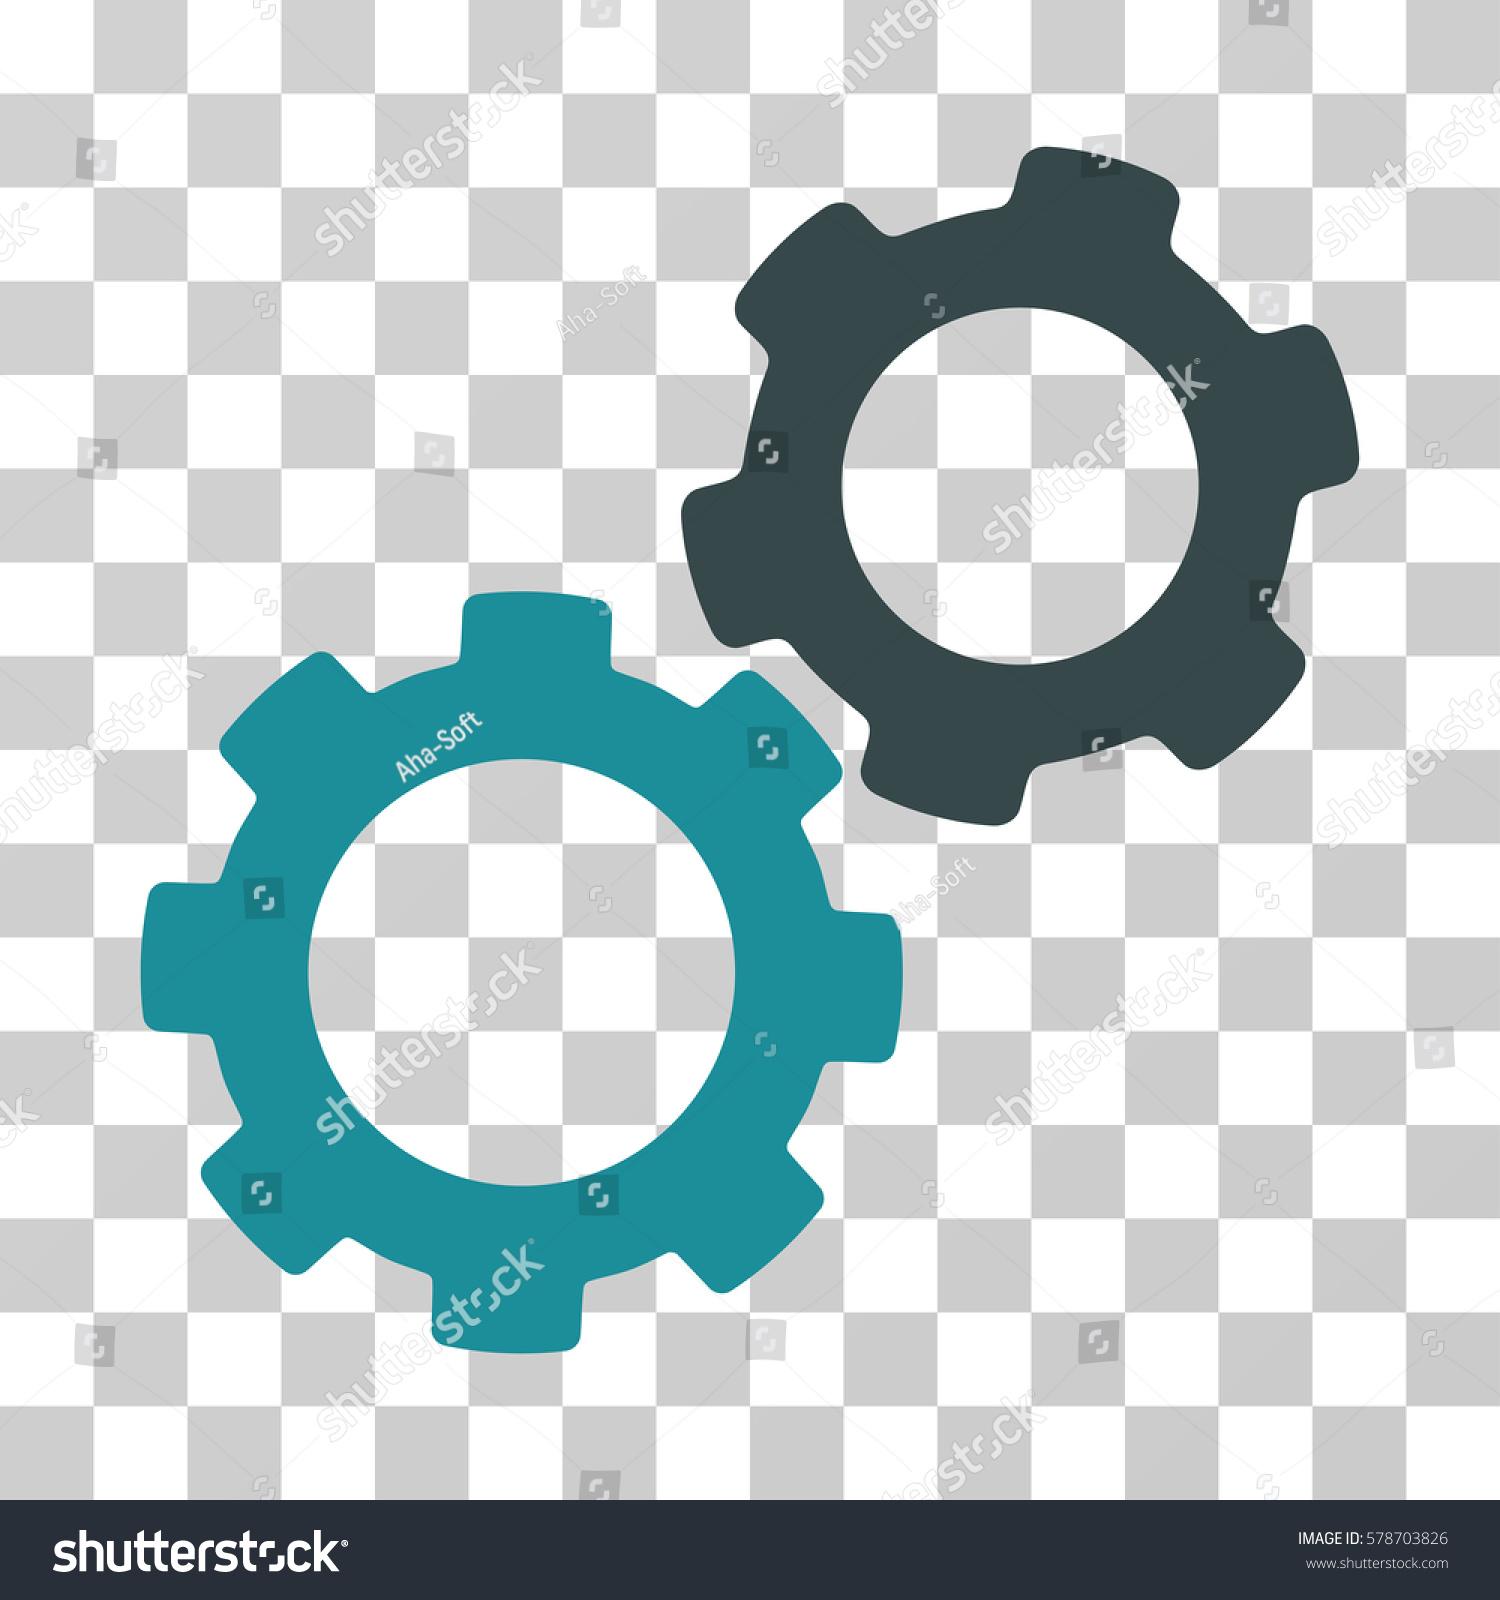 Gears Icon Vector Illustration Style Flat Stock Vector 578703826 ...